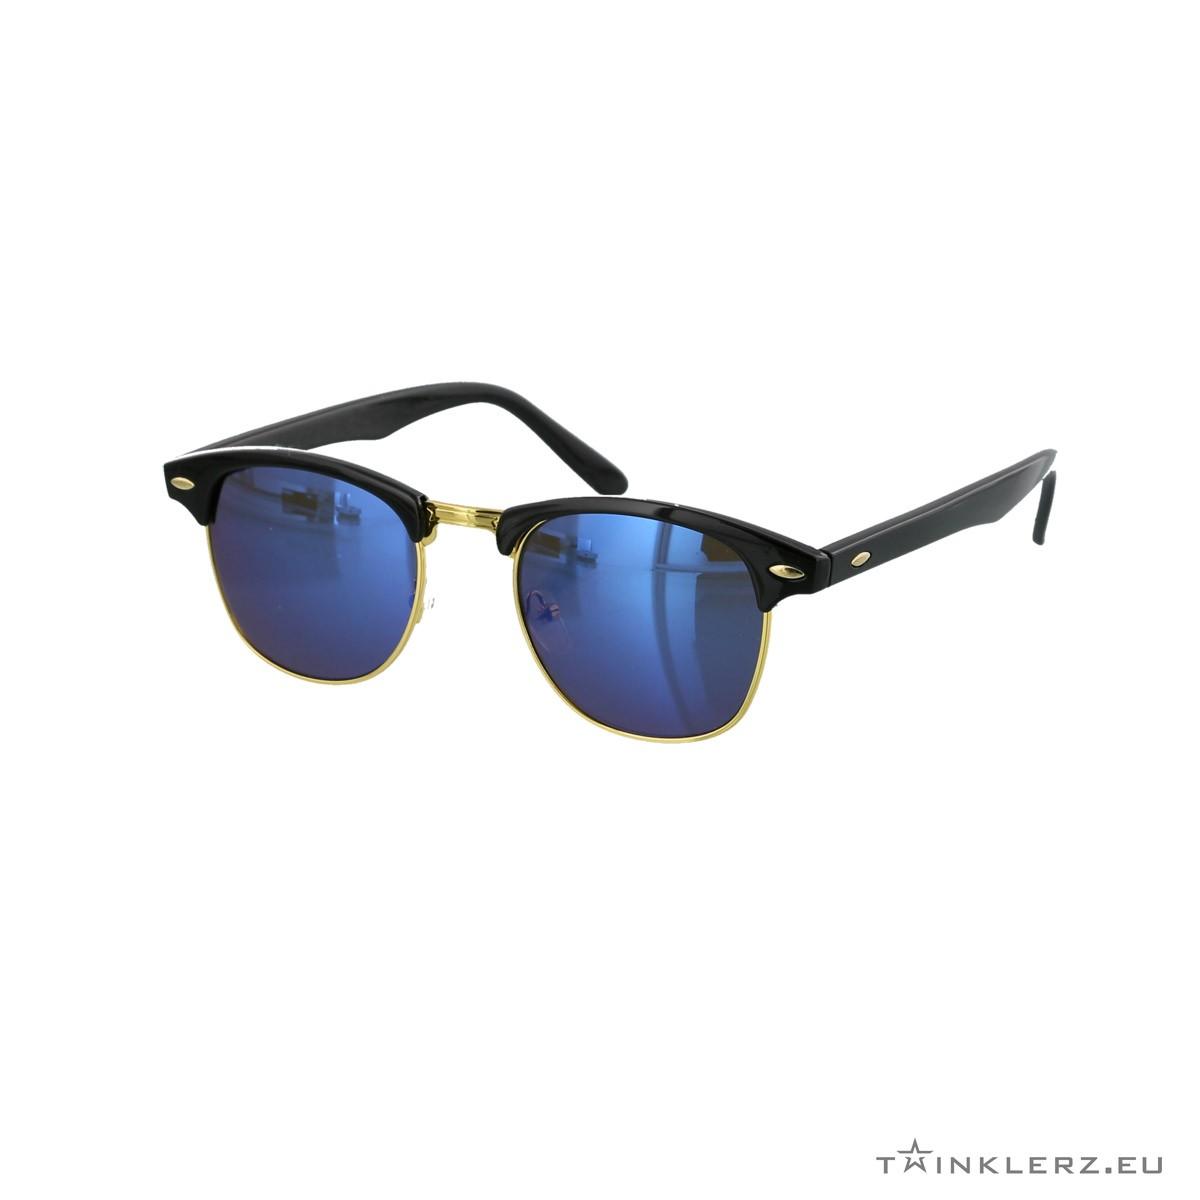 Black clubmaster classic sunglasses blue mirrored lenses